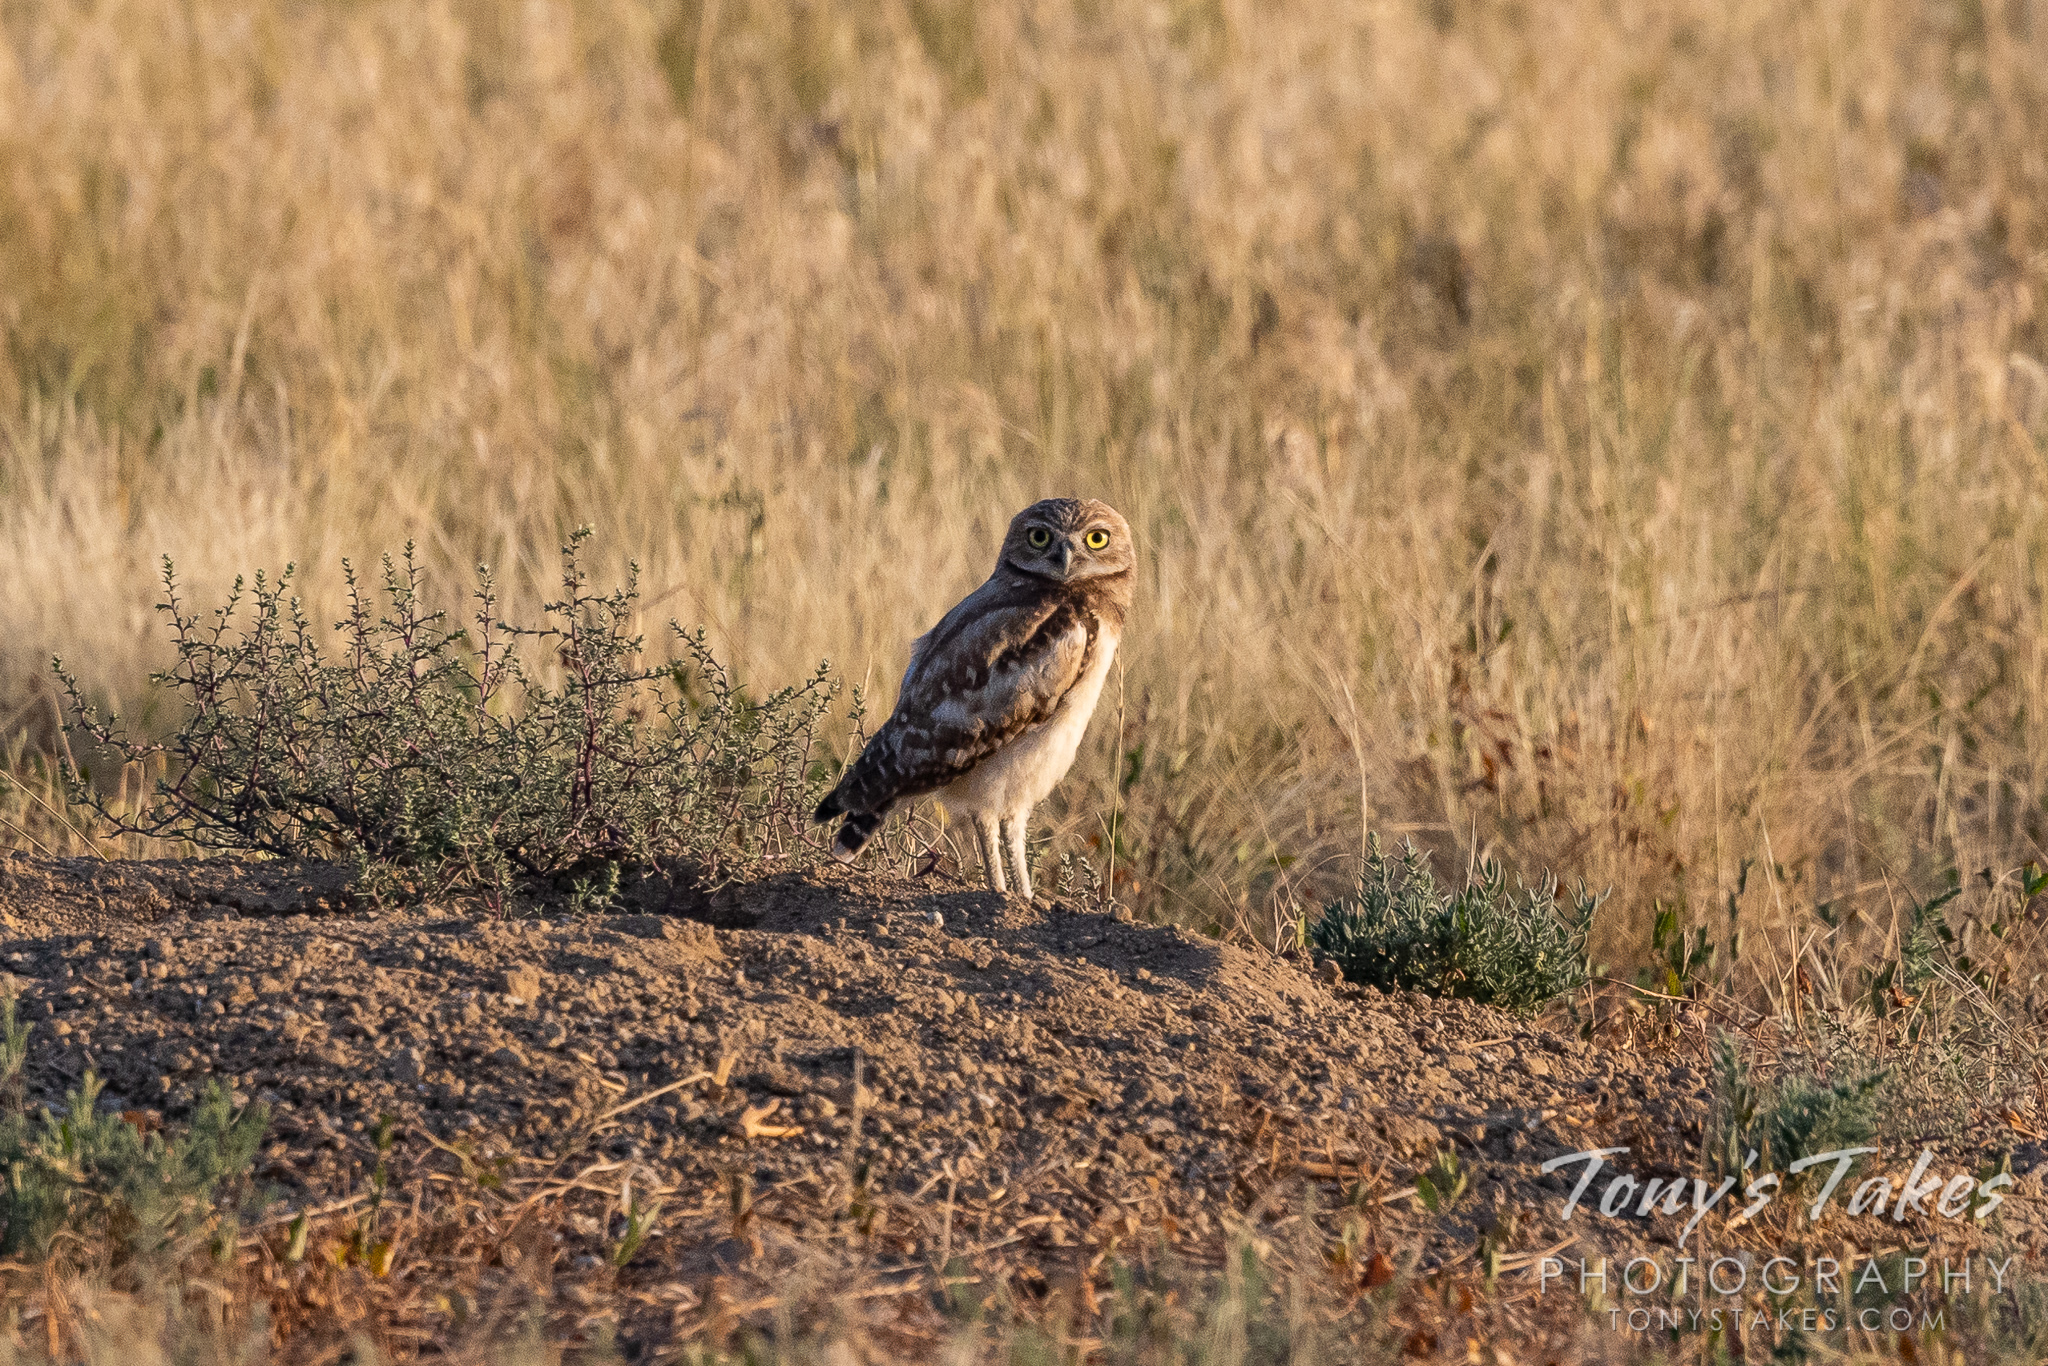 The last burrowing owl of the season?